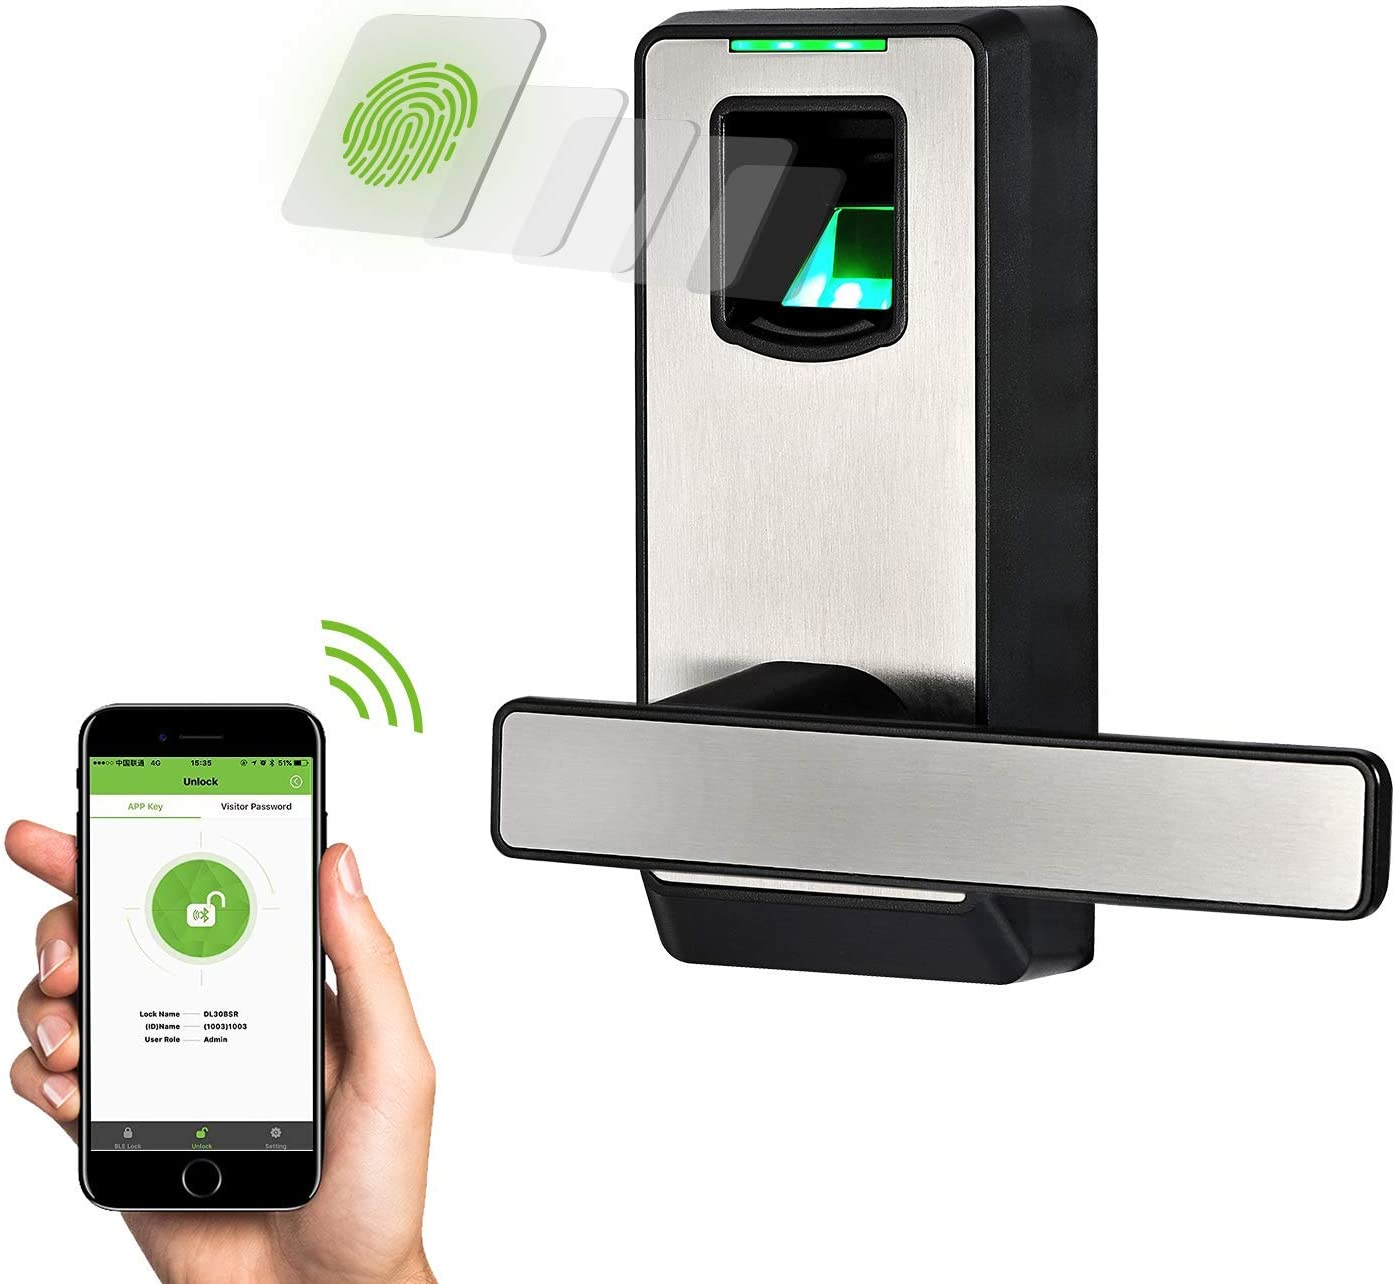 Zink Alloy ZKTeco Keyless Door Lock,Bluetooth Smart Lock,Digital Door Lock Touchscreen Keypad 5 pcs RFID Cards App Control Anti-peep Password Door Locks for Office Home